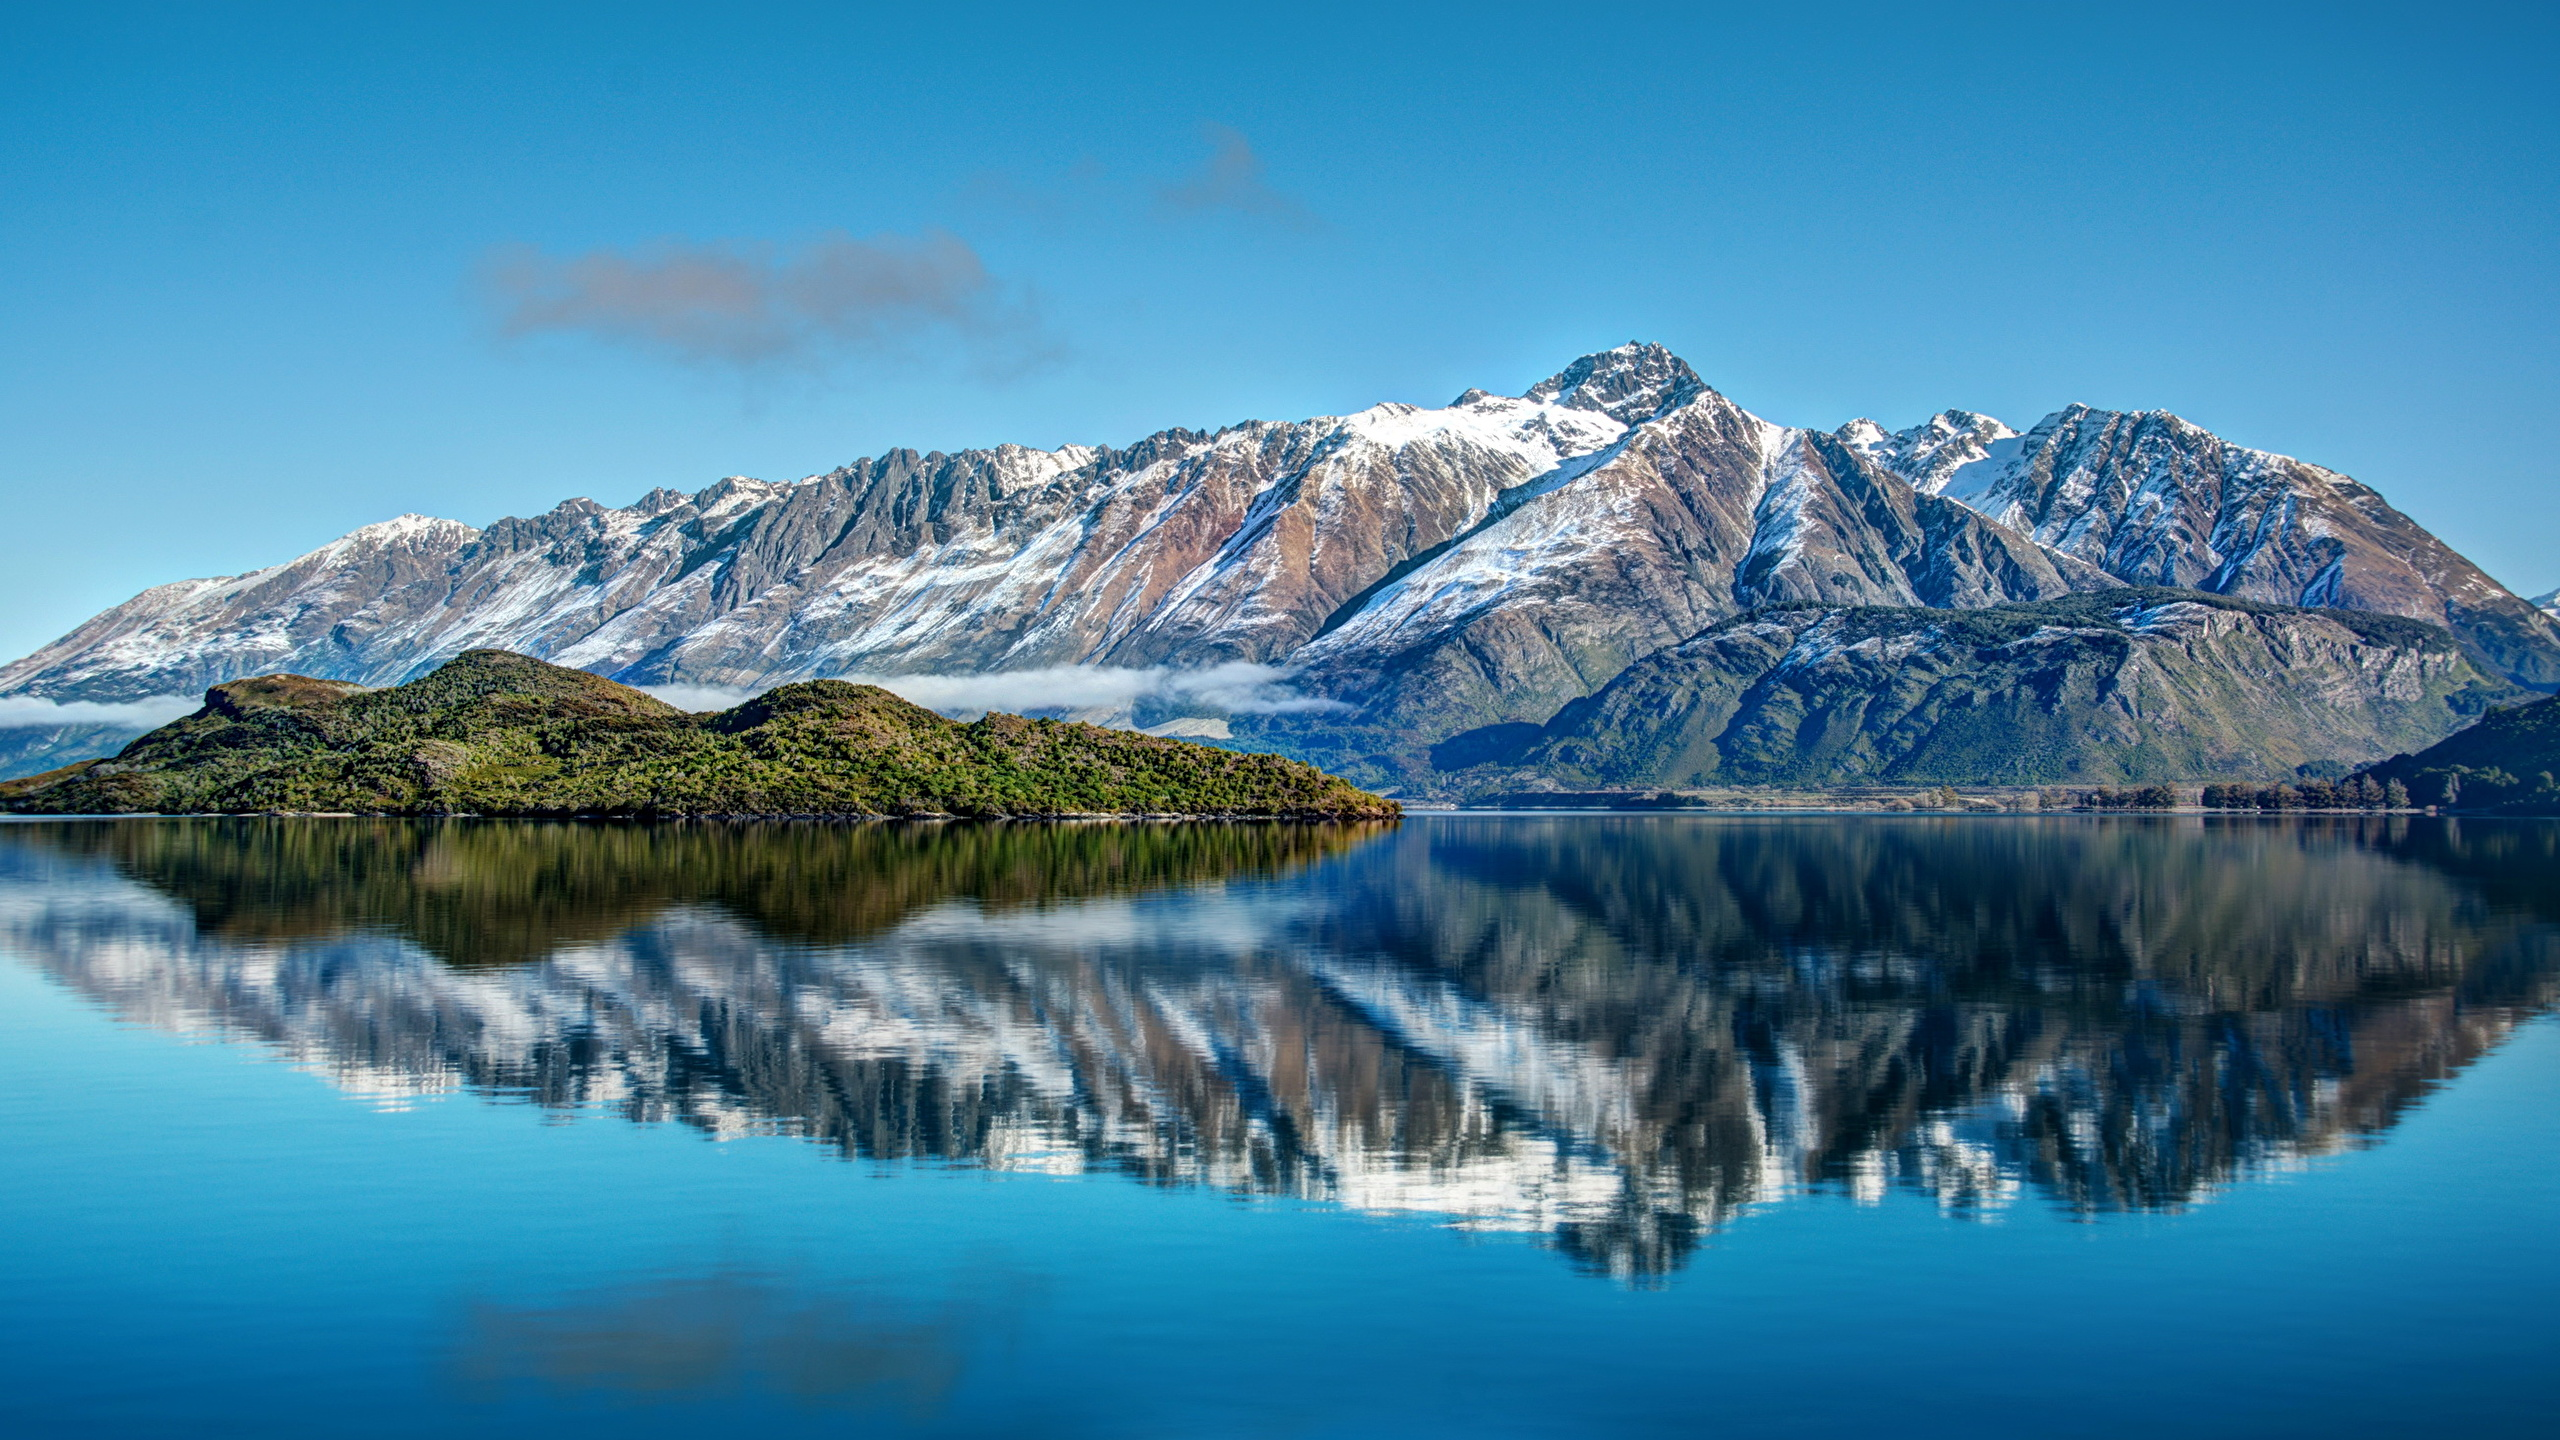 New Zealand Desktop Backgrounds - HD Wallpaper